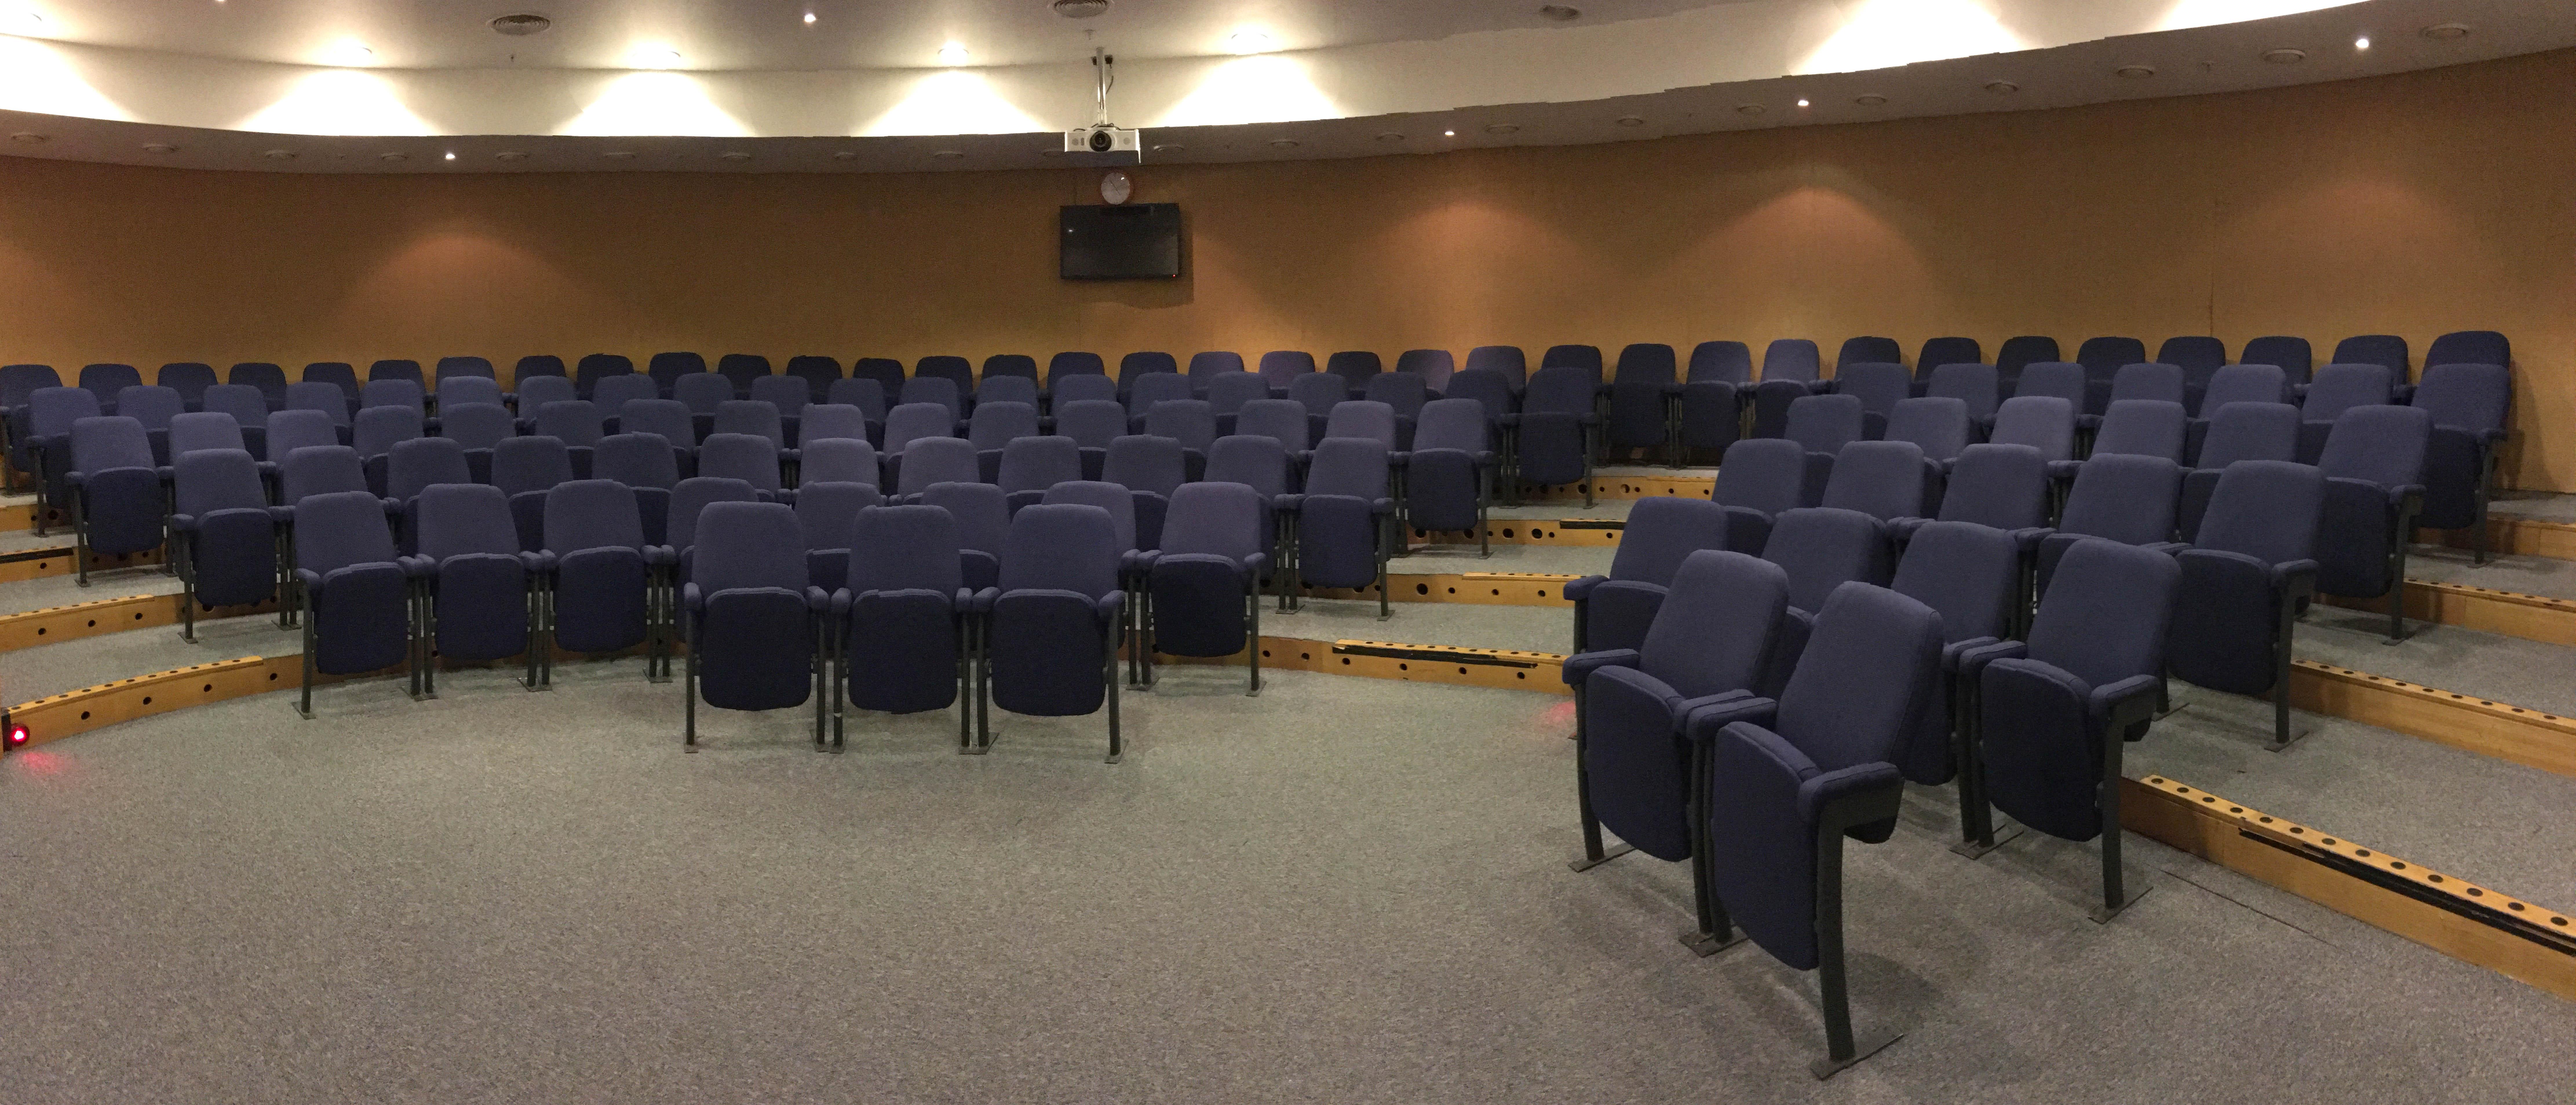 Auditorium-seating-reupholstery